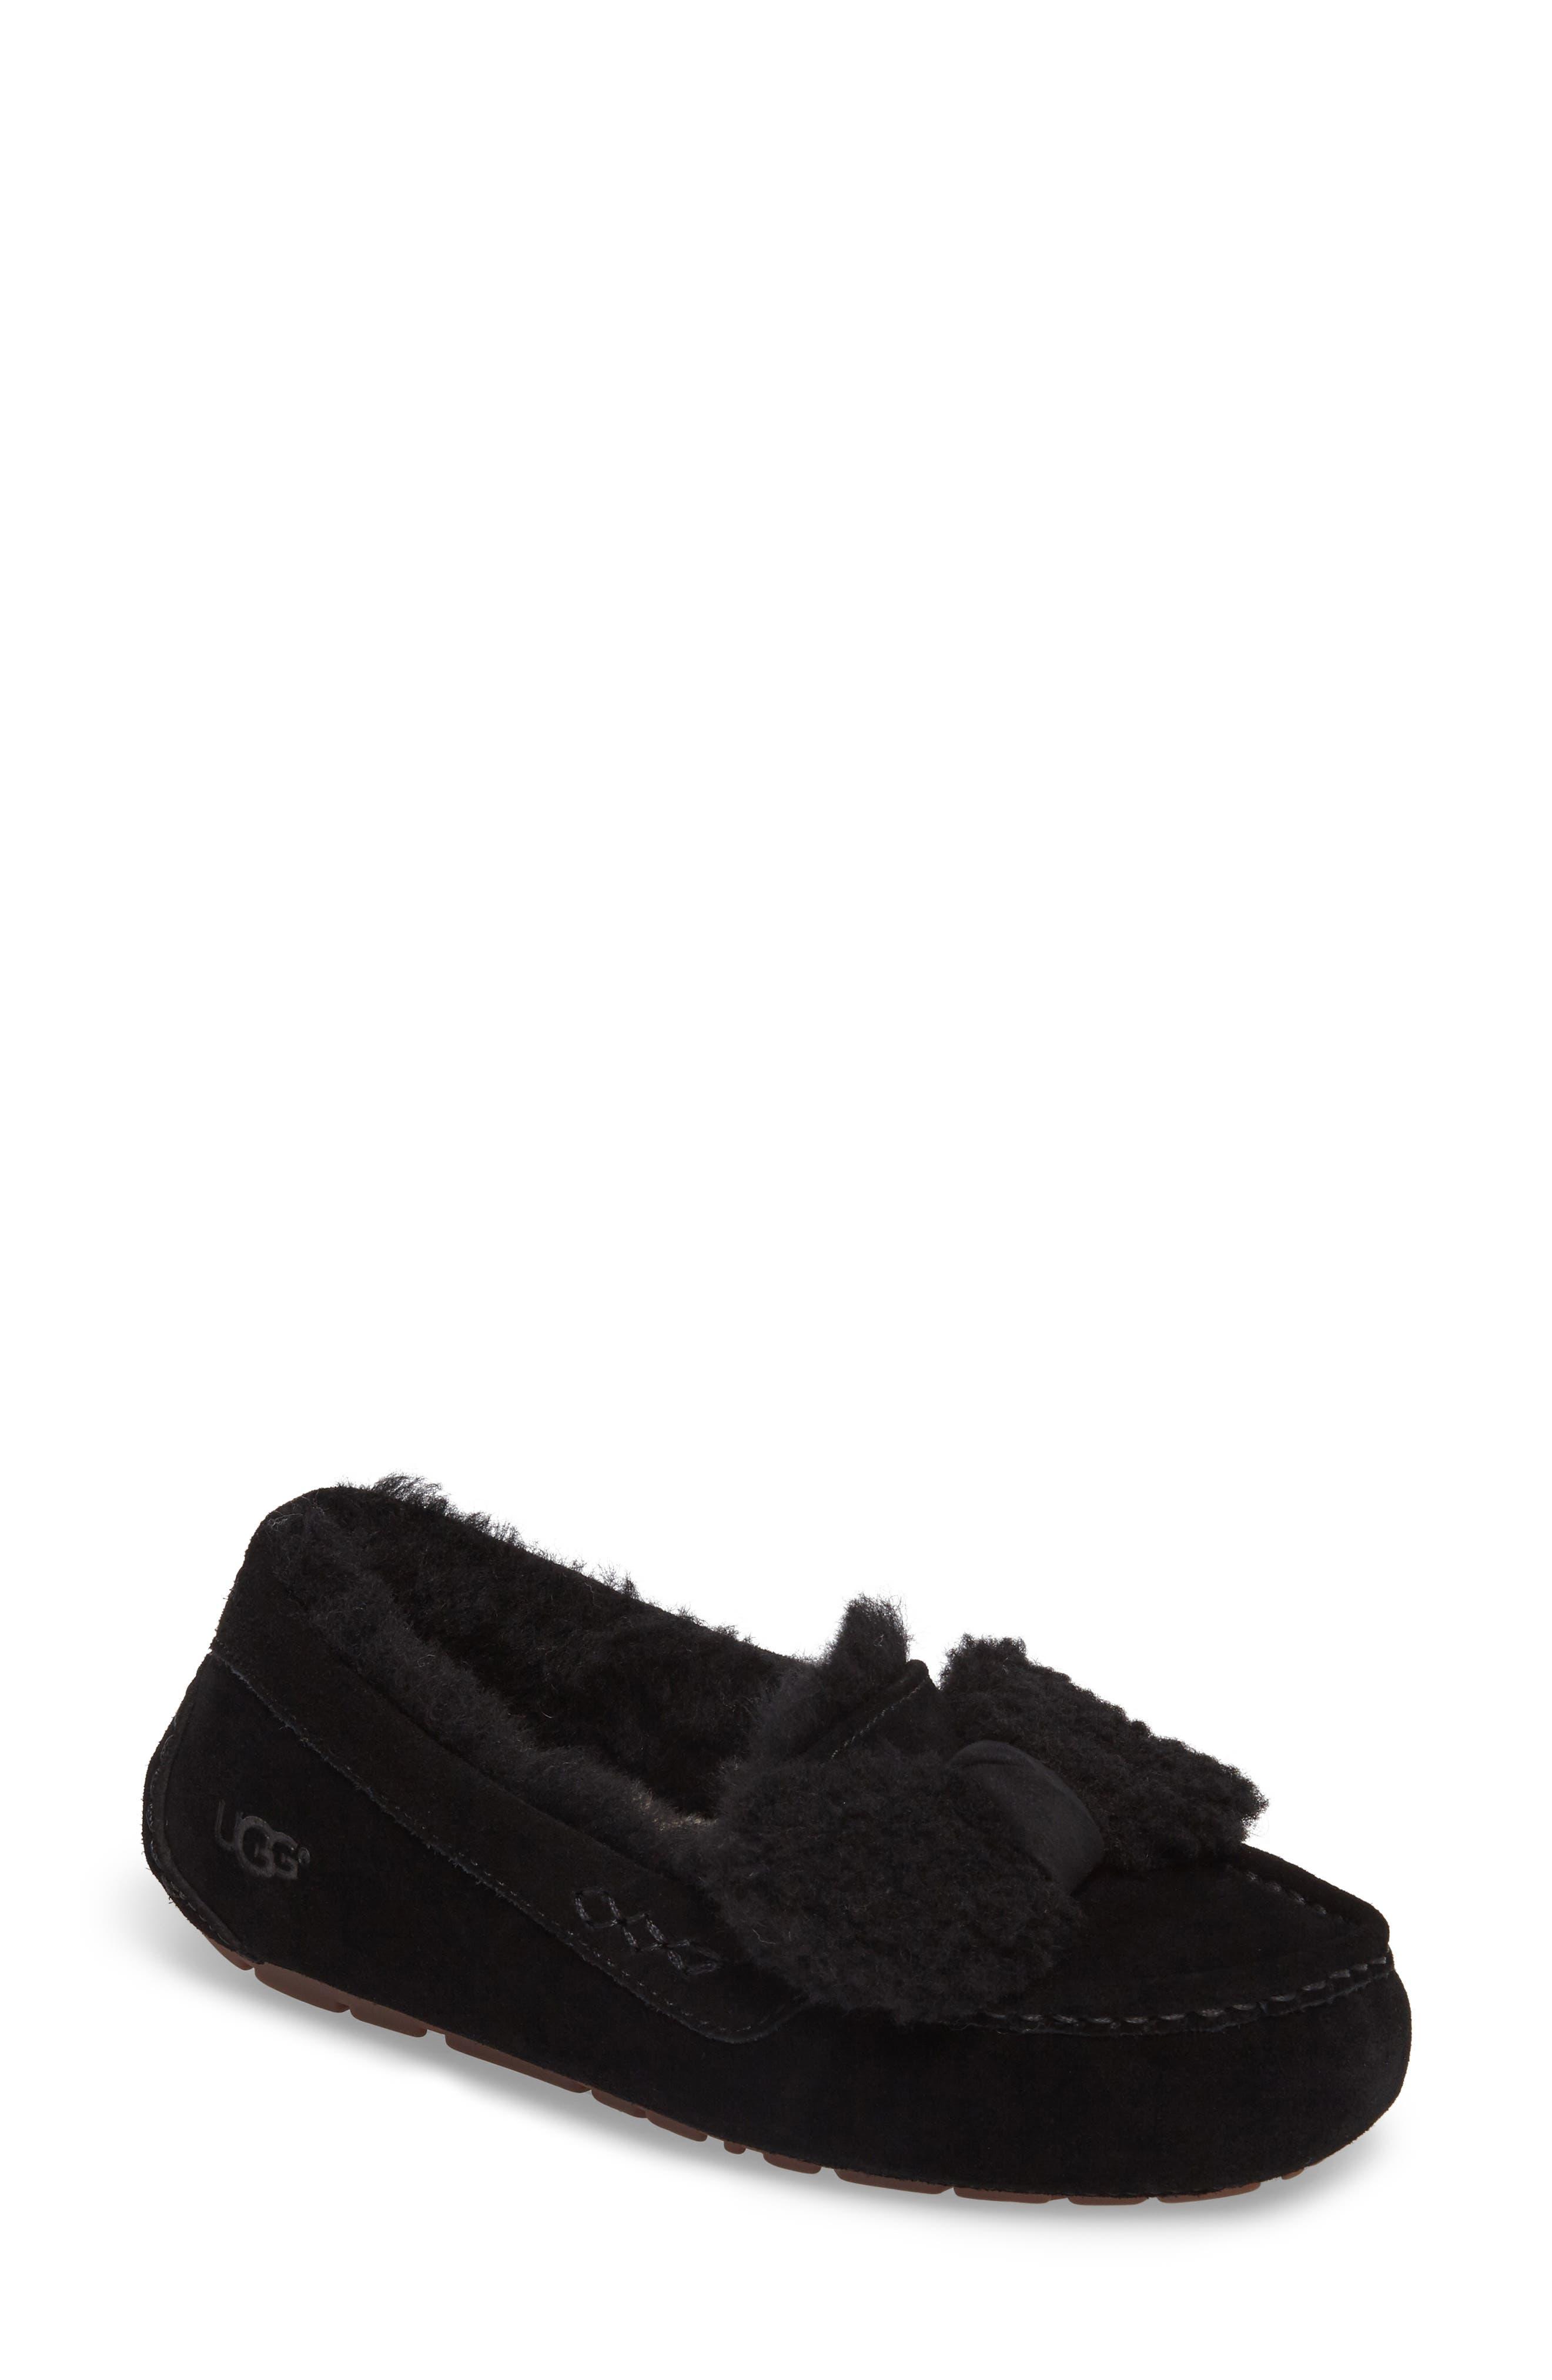 Alternate Image 1 Selected - UGG® Ansley Bow Slipper